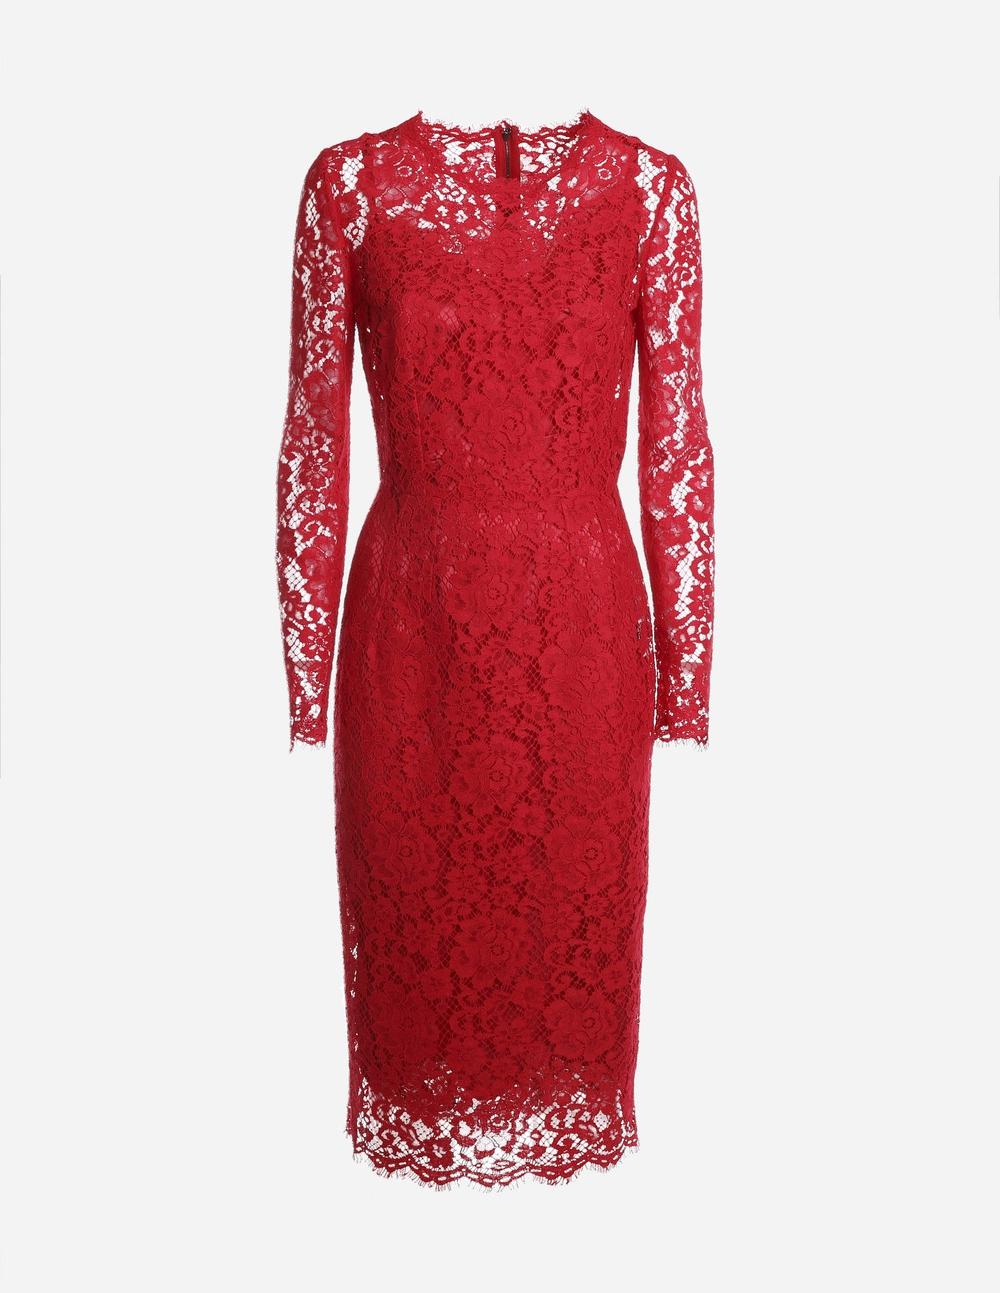 21SS 돌체앤가바나 F6H0YT 레이스 미디 드레스